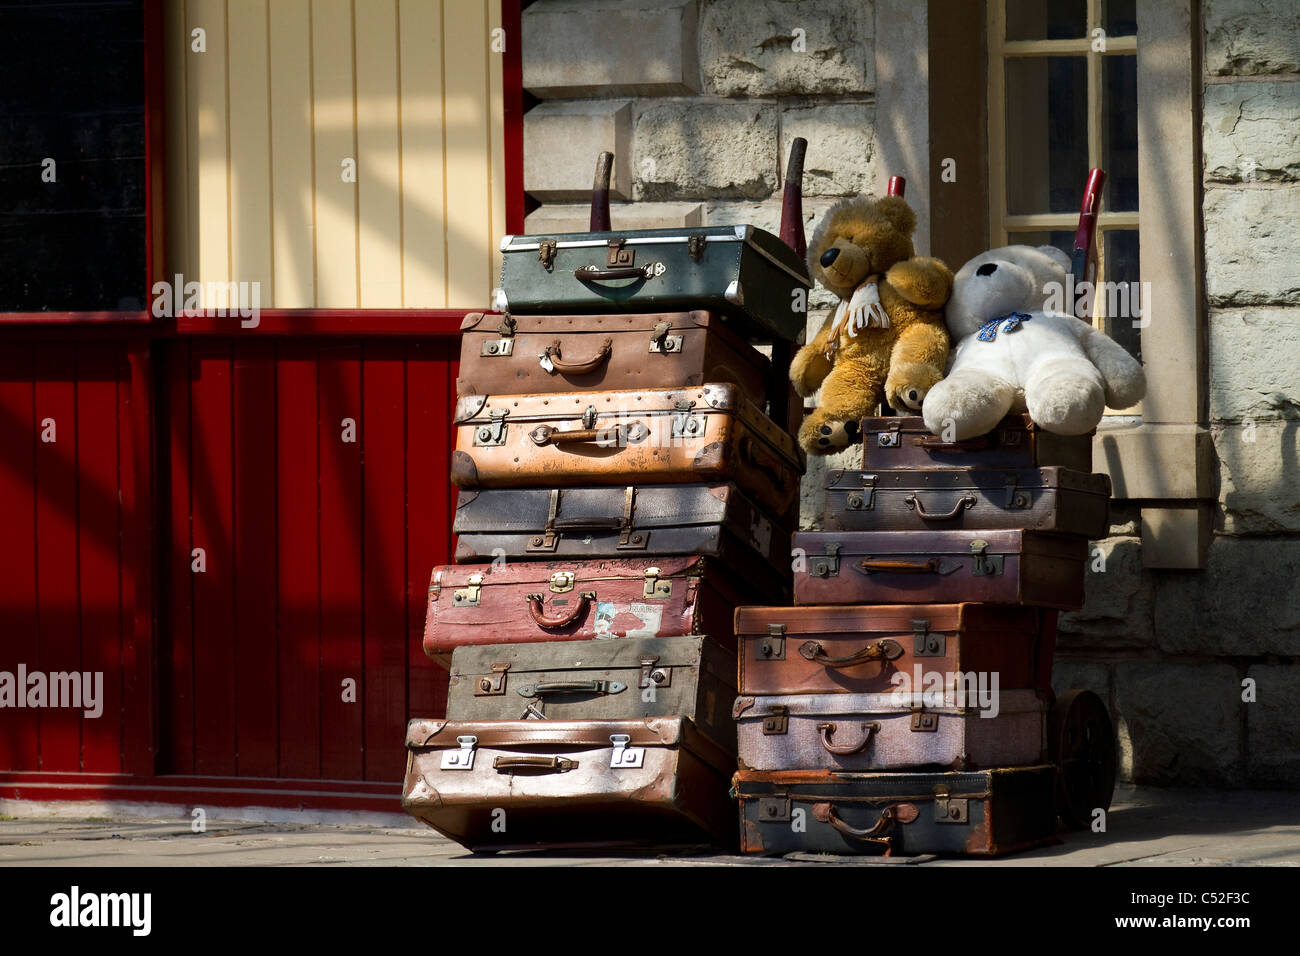 Passengers Old Type vintage leather luggage cases at Ramsbottom Station platform. ELR East Lancashire Railway Heritage Stock Photo